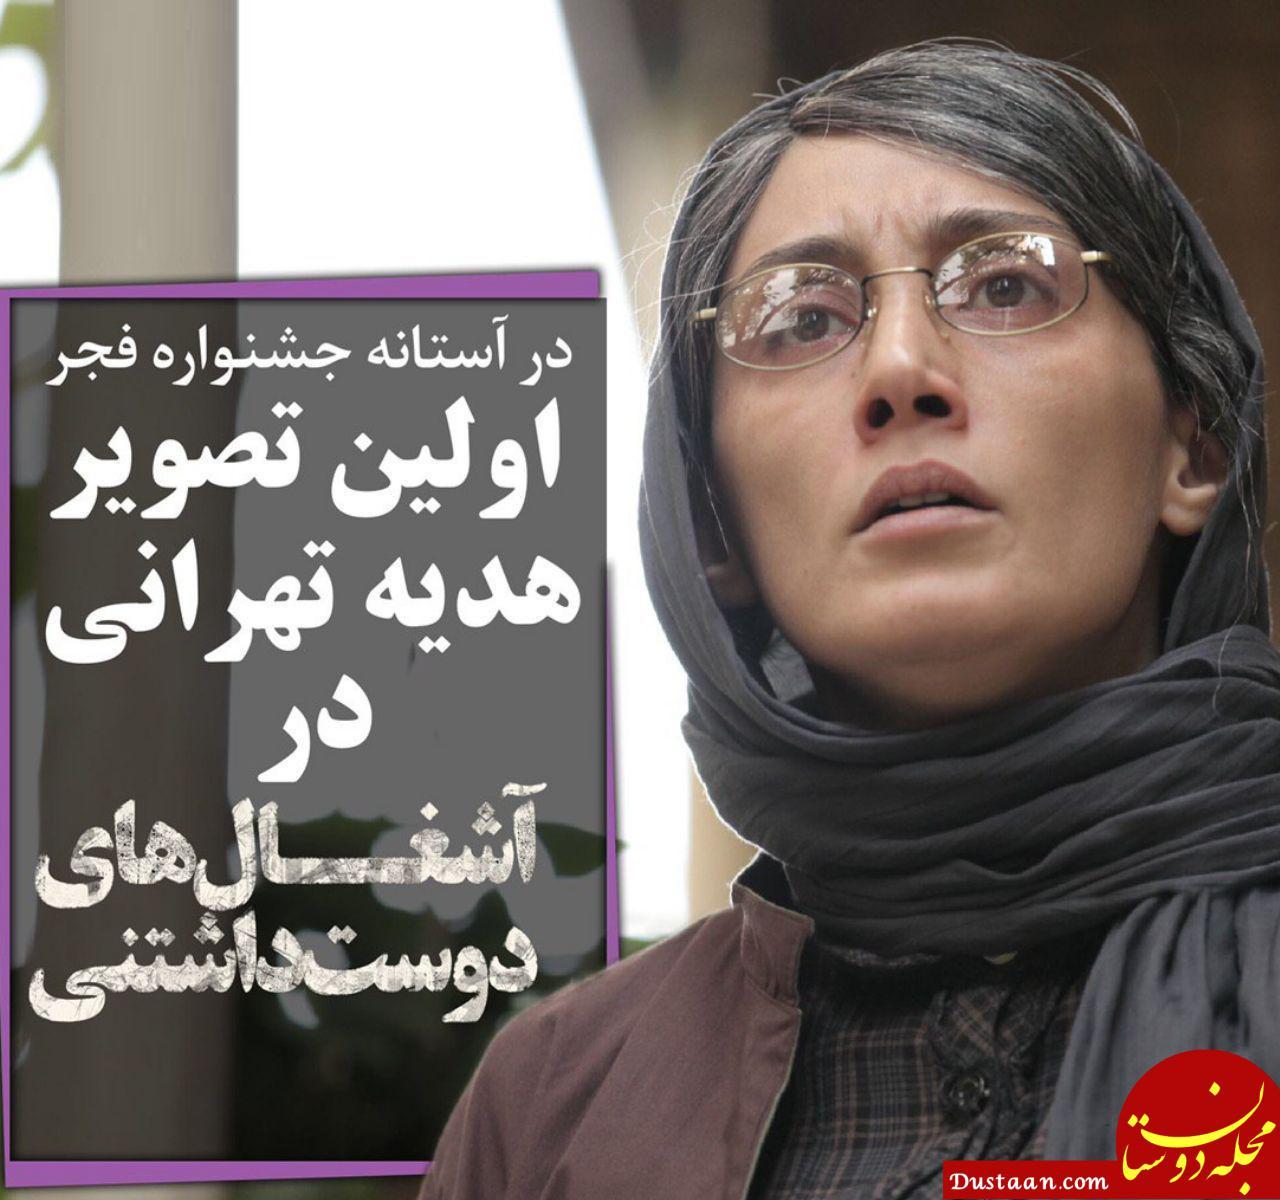 www.dustaan.com هدیه تهرانی در «آشغال های دوست داشتنی» +عکس